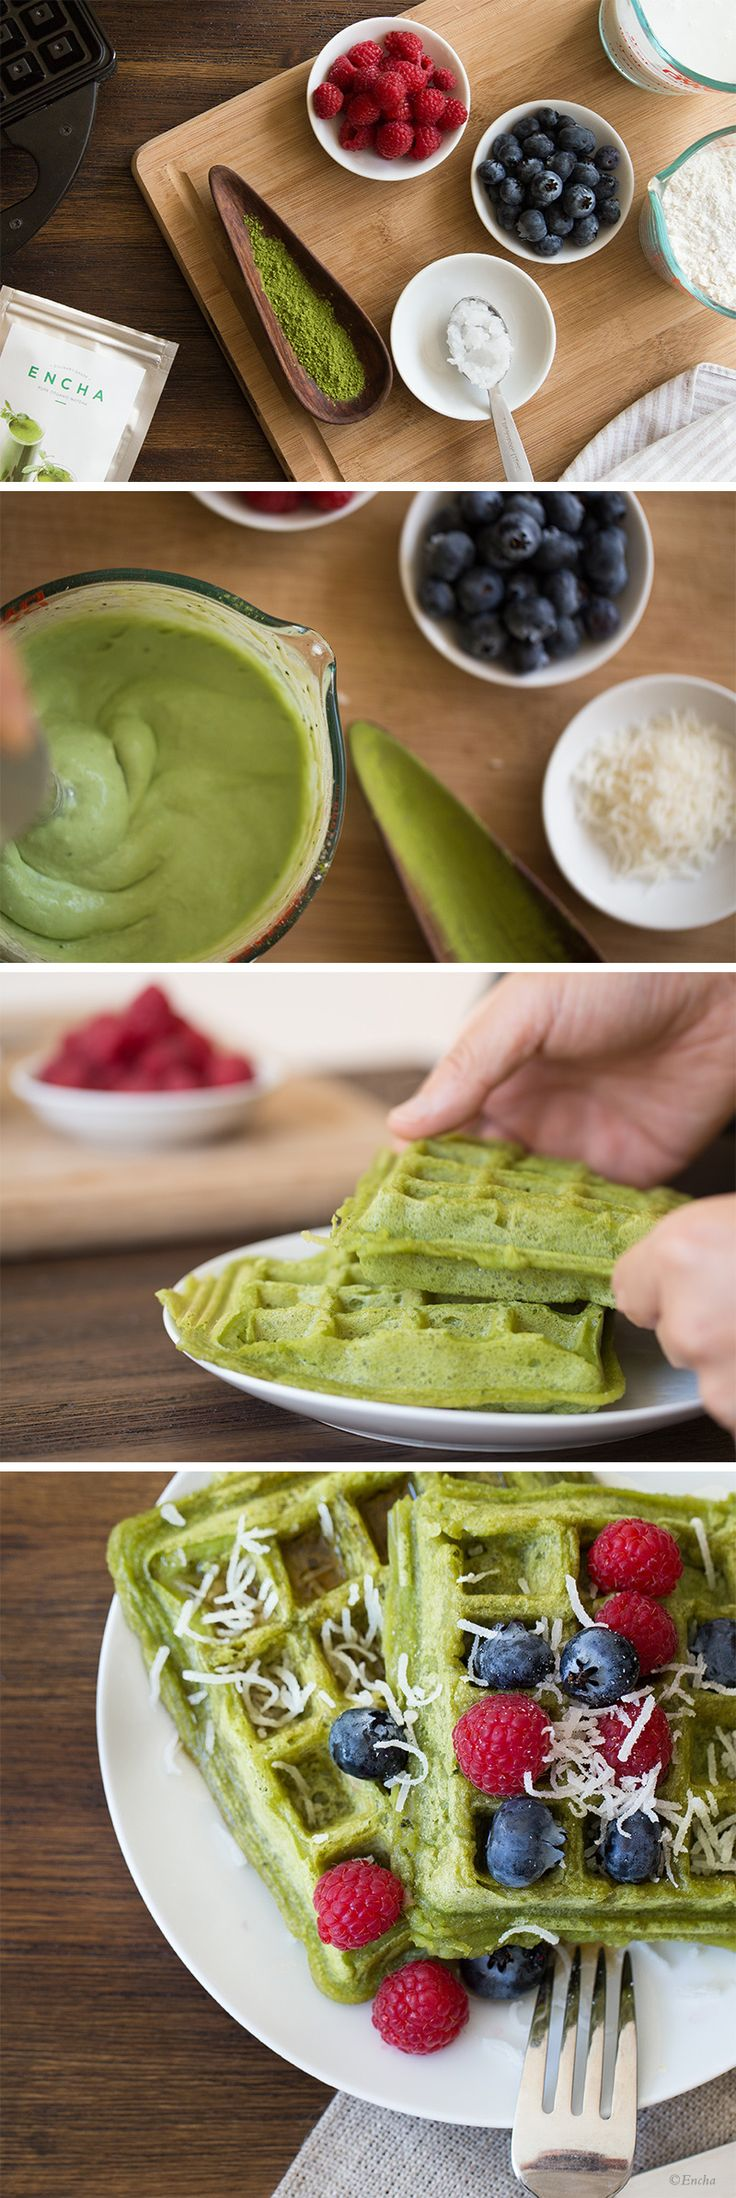 Matcha Waffle Recipe: Vegan Gluten-Free Coconut Encha Organic Matcha Waffle | encha.com | #vegan #waffle #matcha